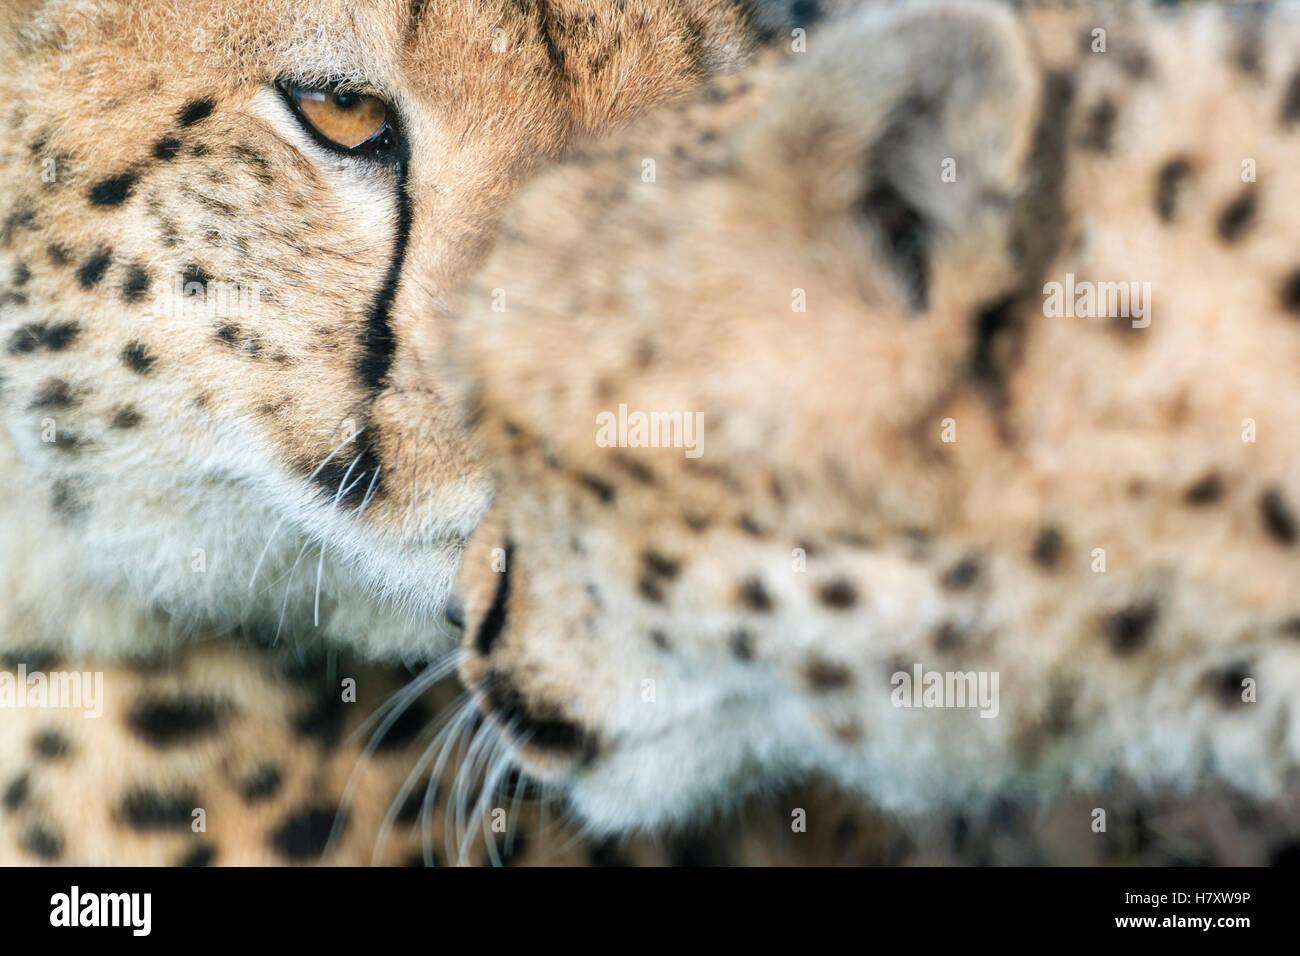 Gepard (Acinonix Jubatus) Porträt, Gruß, Nahaufnahme, Masai Mara National Reserve, Kenia Stockbild